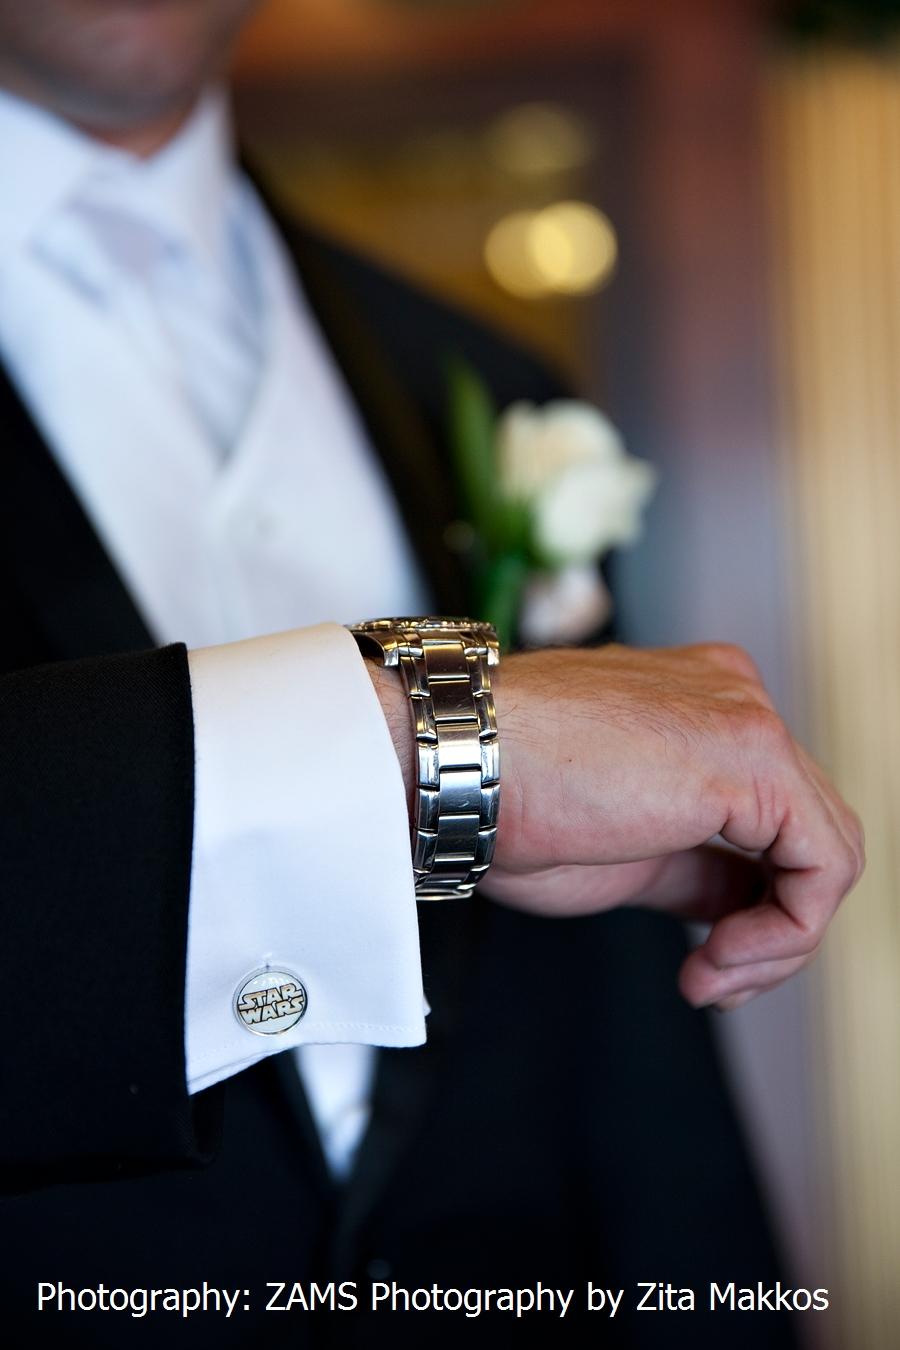 slipknot_jim_root_cuff_links_men_wedding_groomsmen_cufflinks_2.jpg